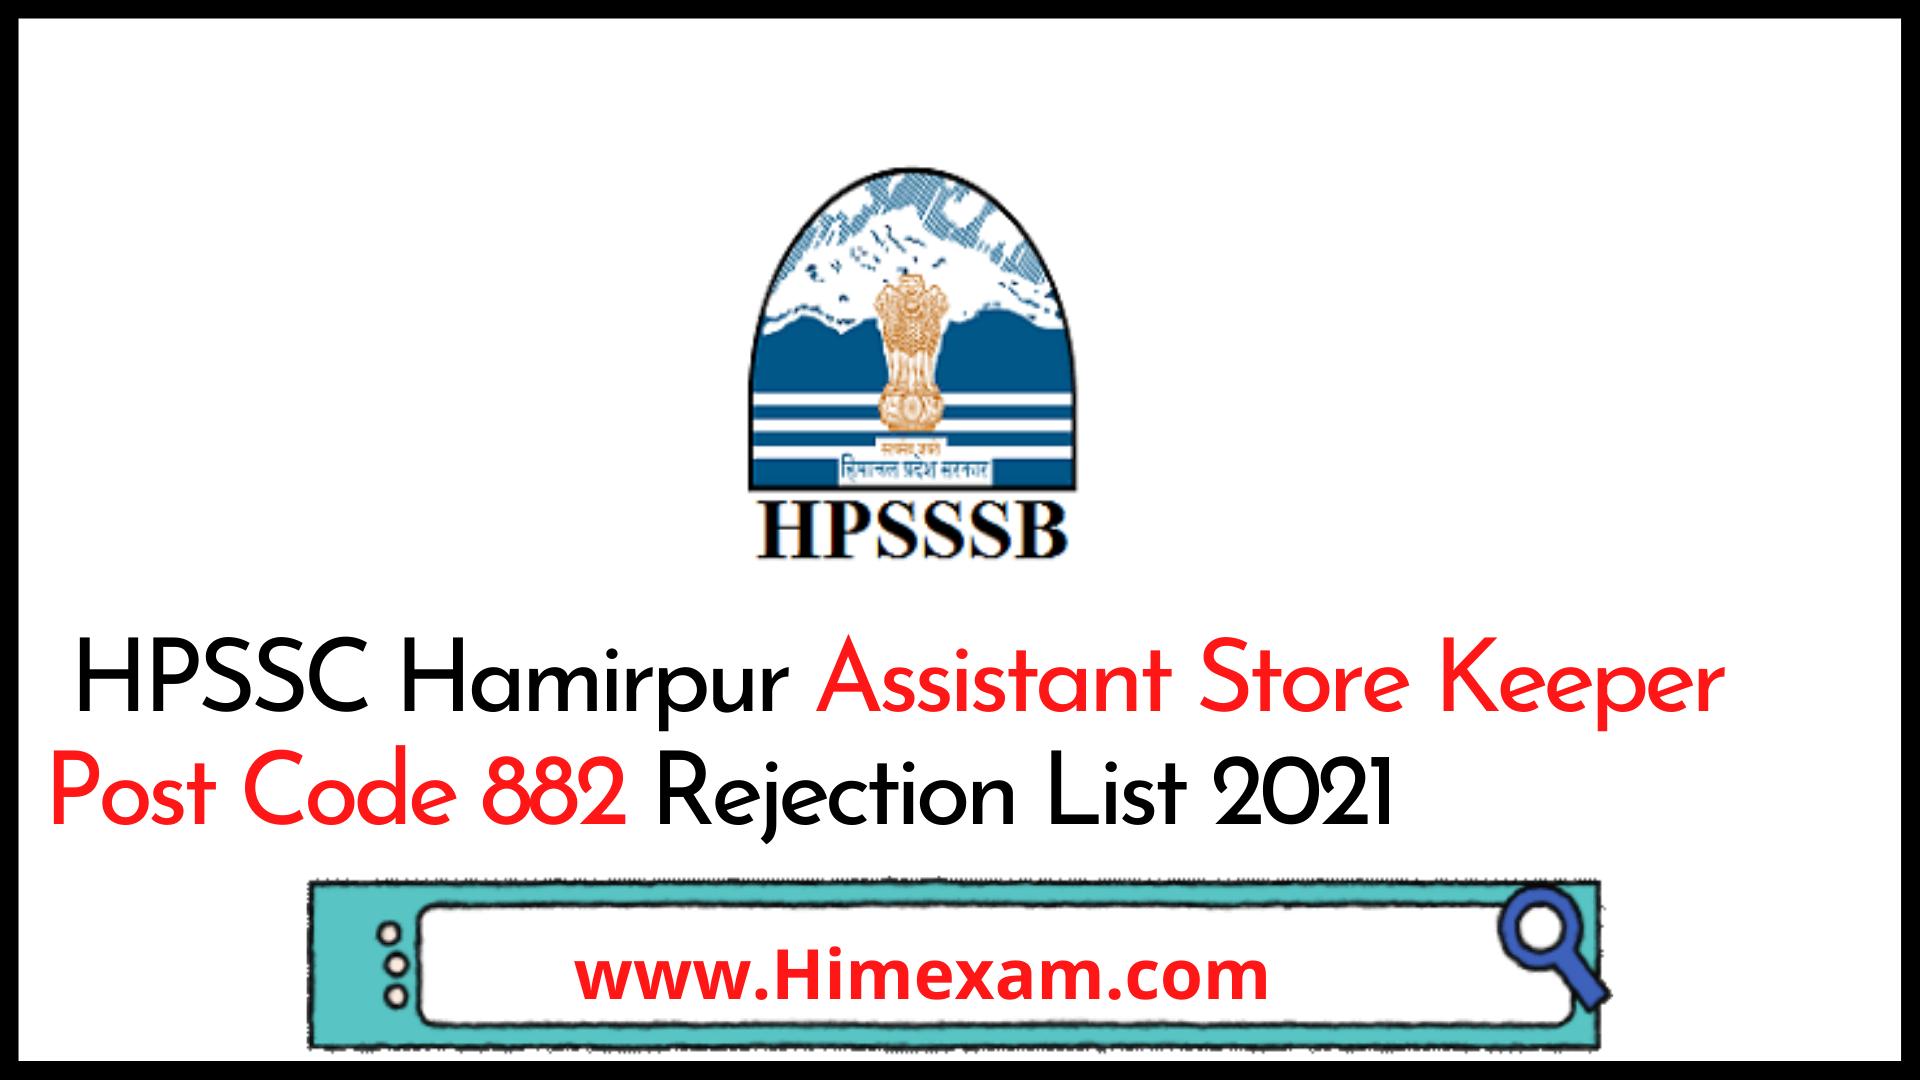 HPSSC Hamirpur Assistant Store Keeper Post Code 882 Rejection List 2021